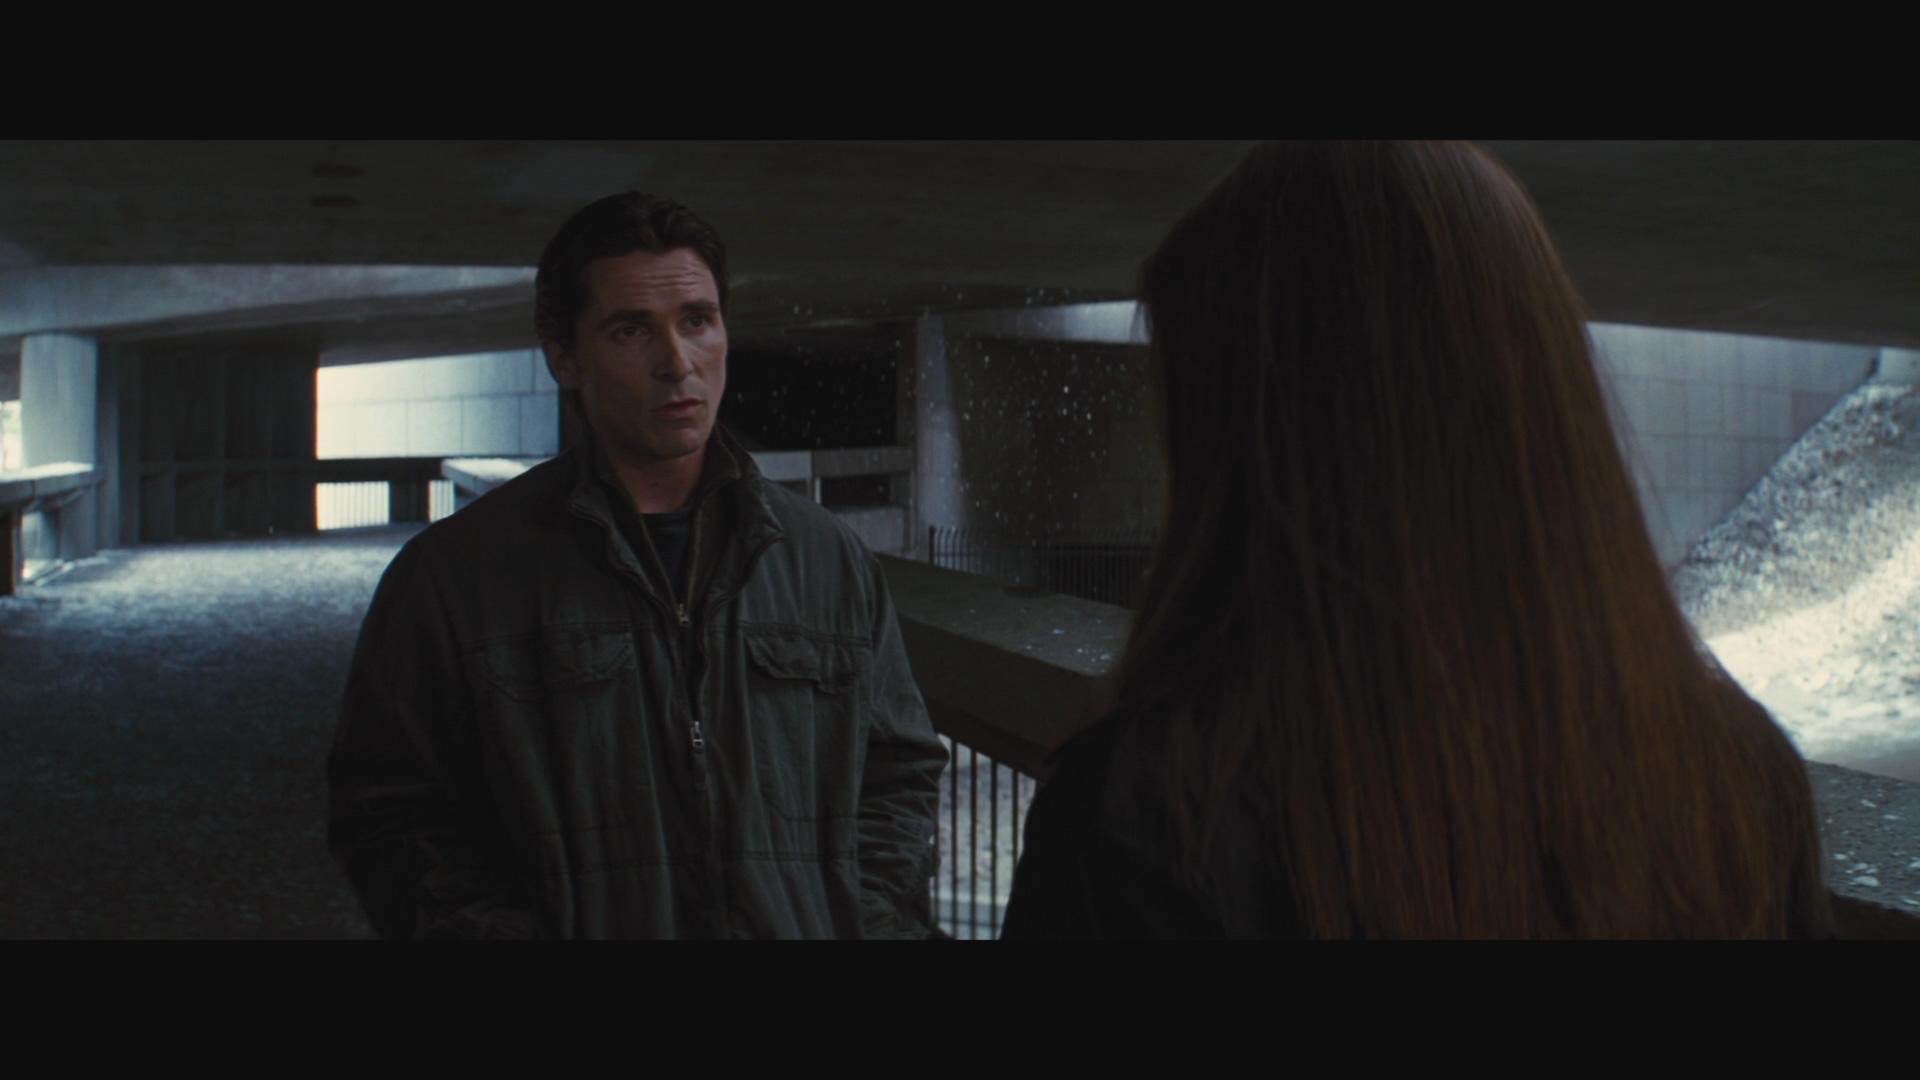 The Dark Knight Rises (2012) - Bruce Wayne and Selina Kyle ...